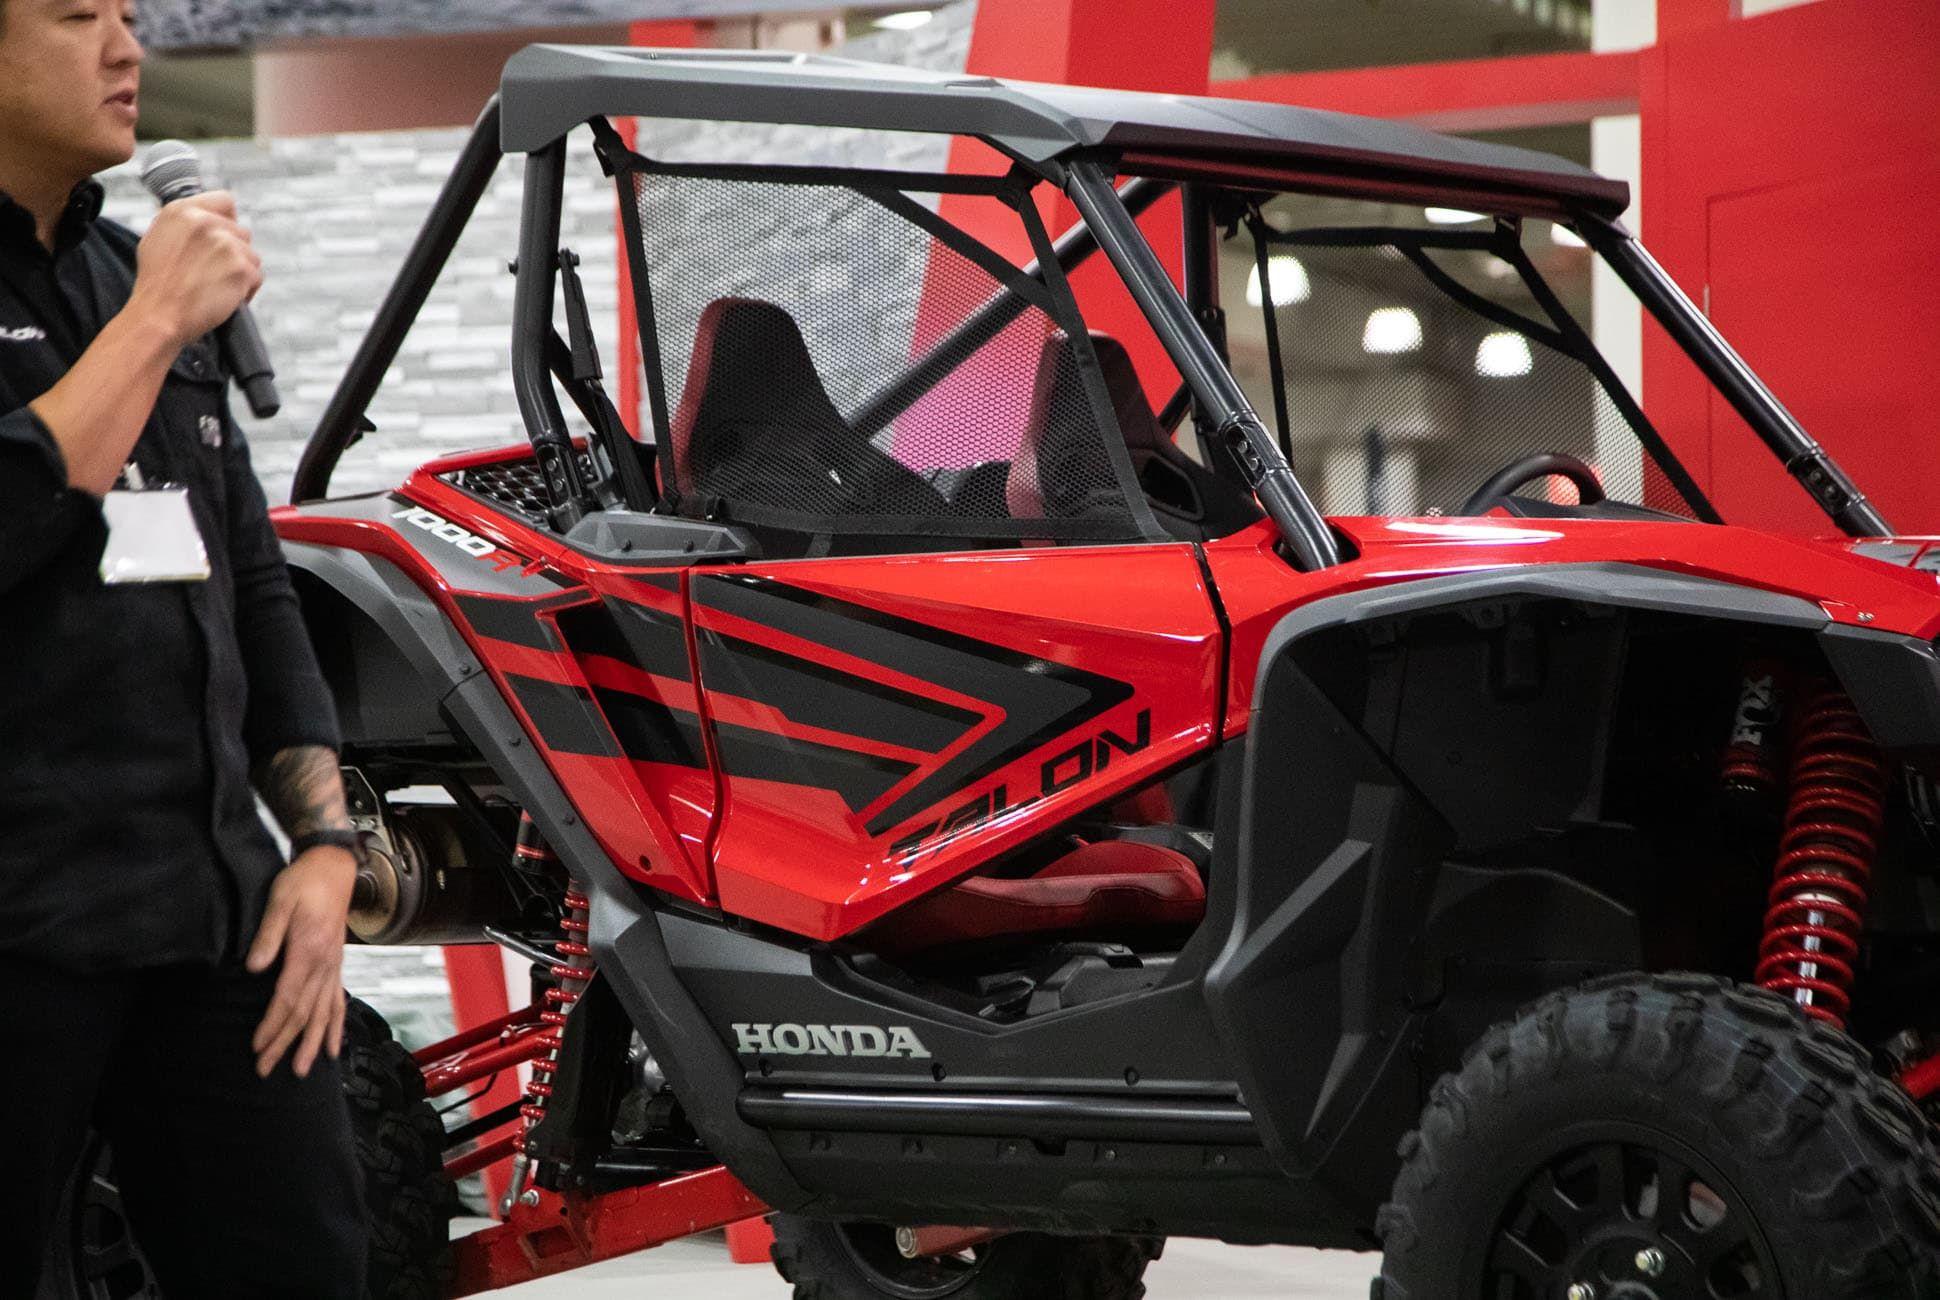 IMS 2018 Show Gear Patrol Honda Slide 06